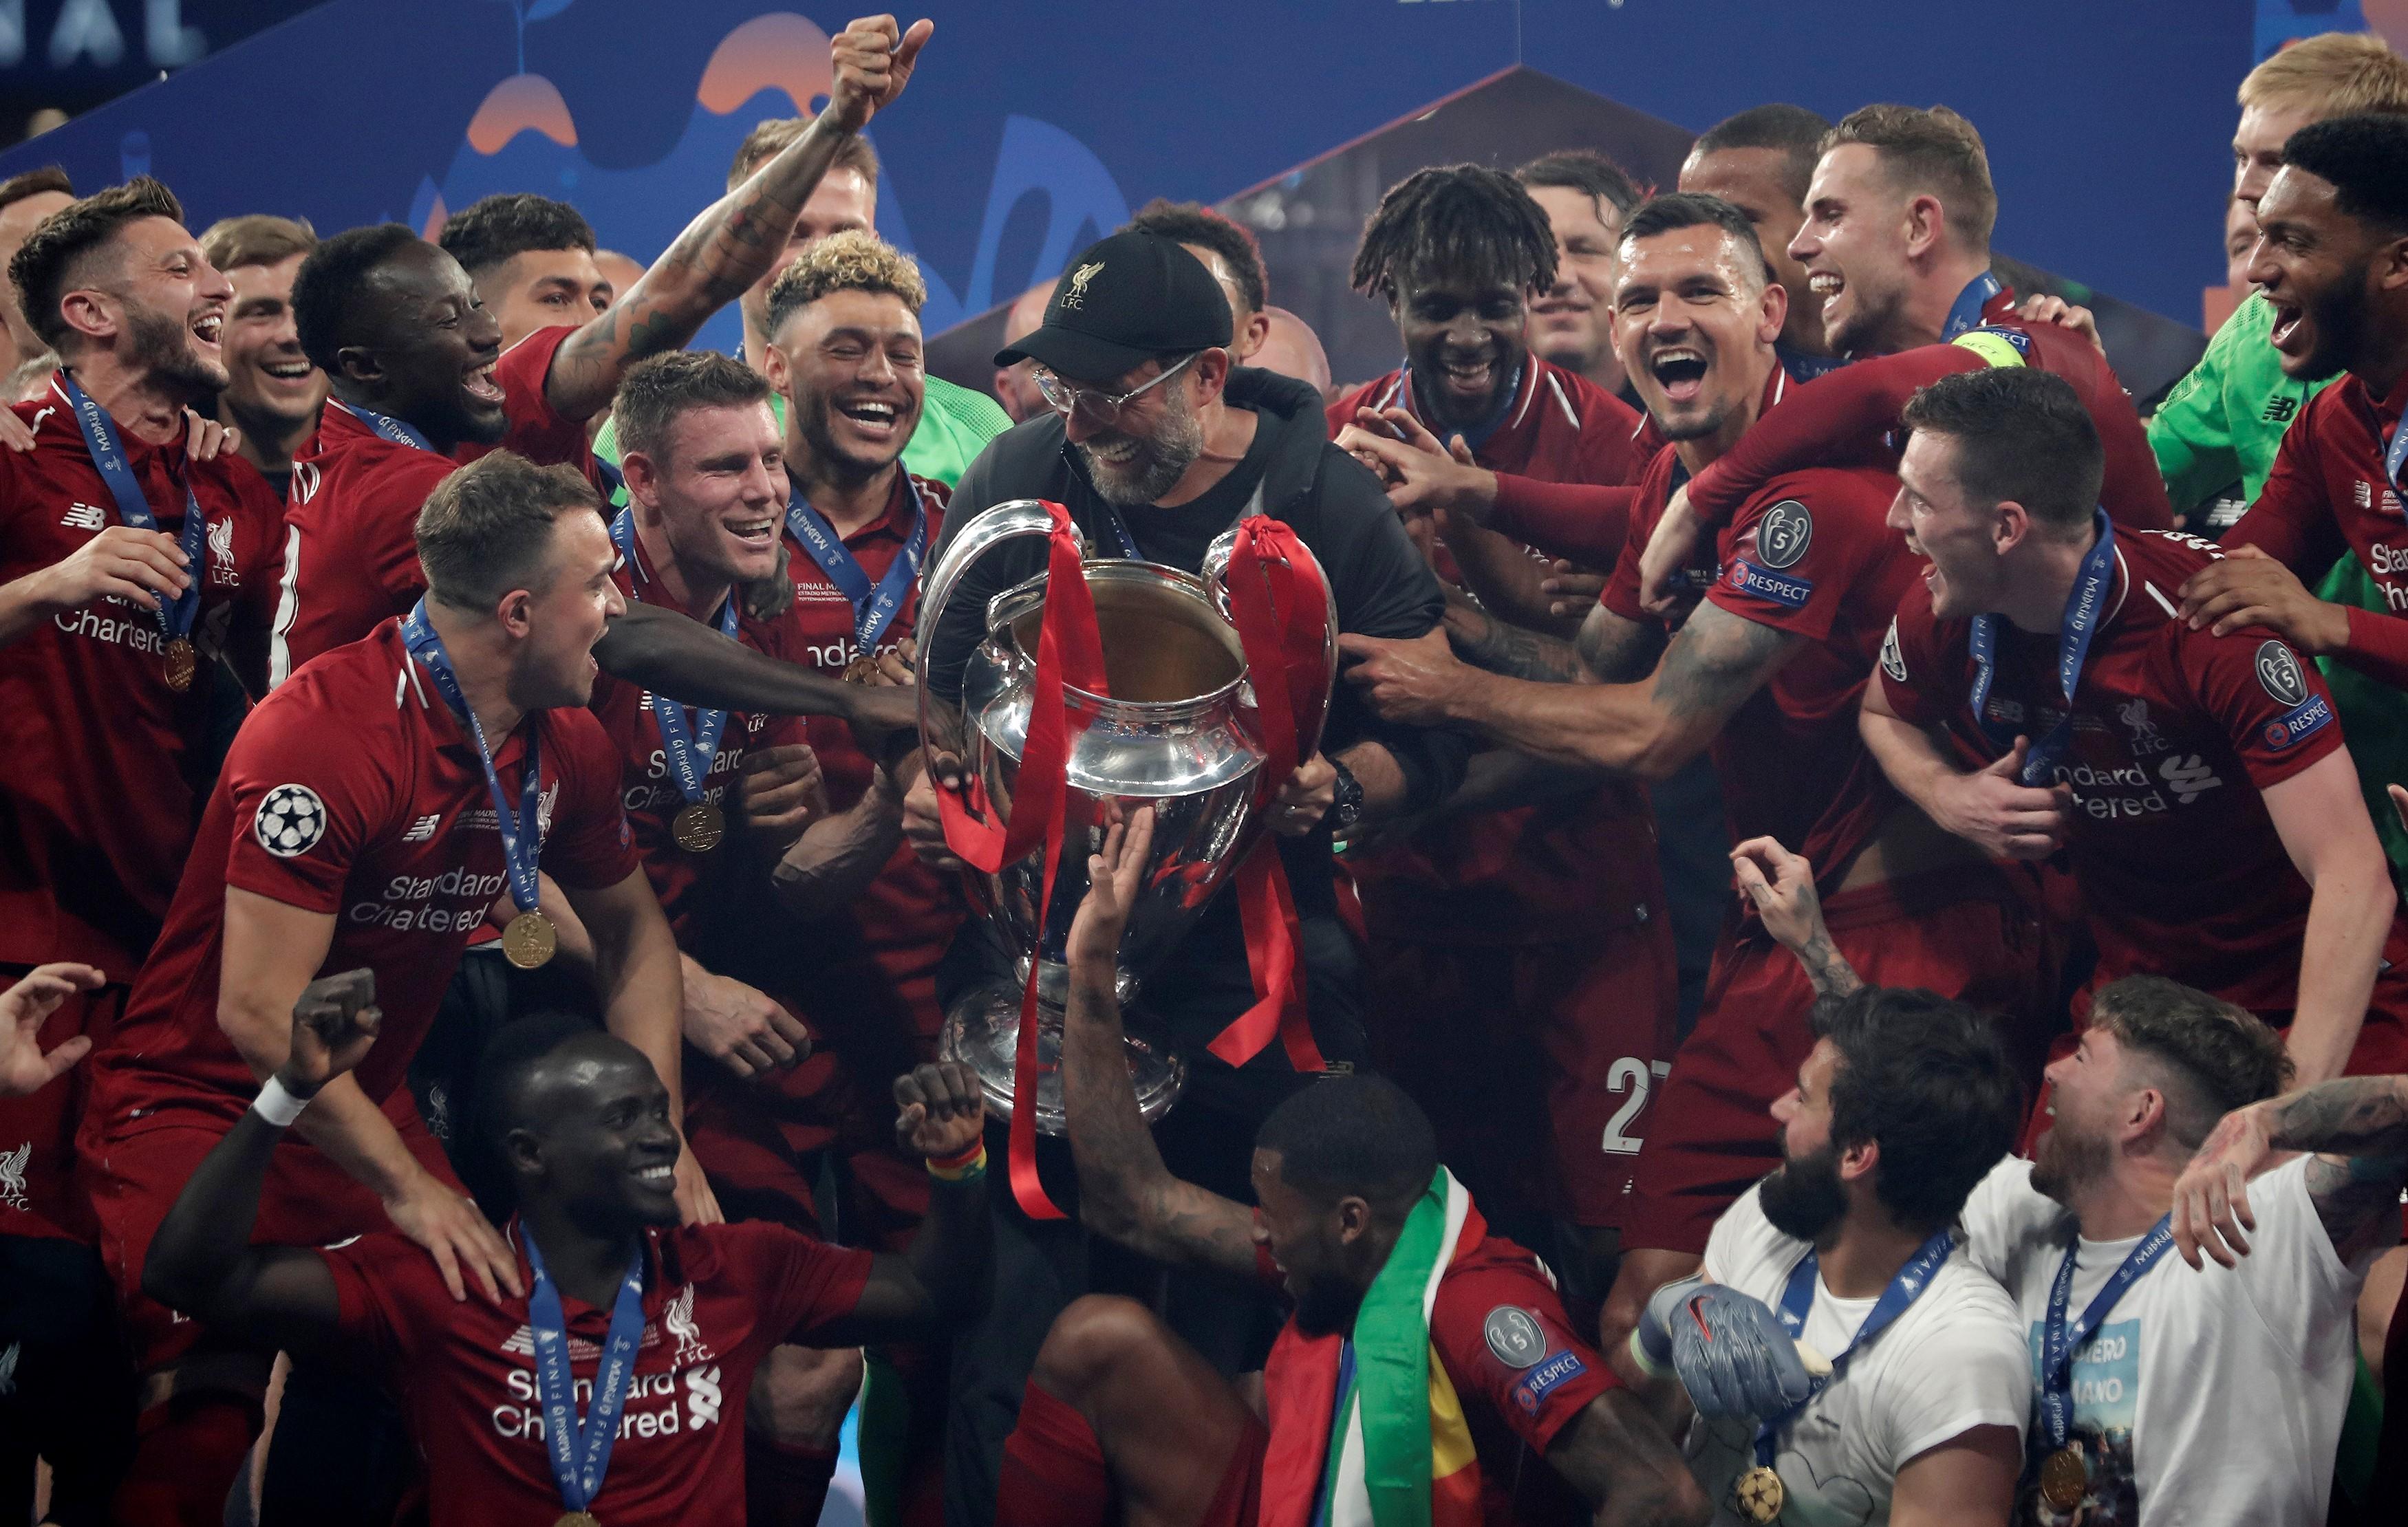 https://i.eurosport.com/2020/06/26/2839409.jpg